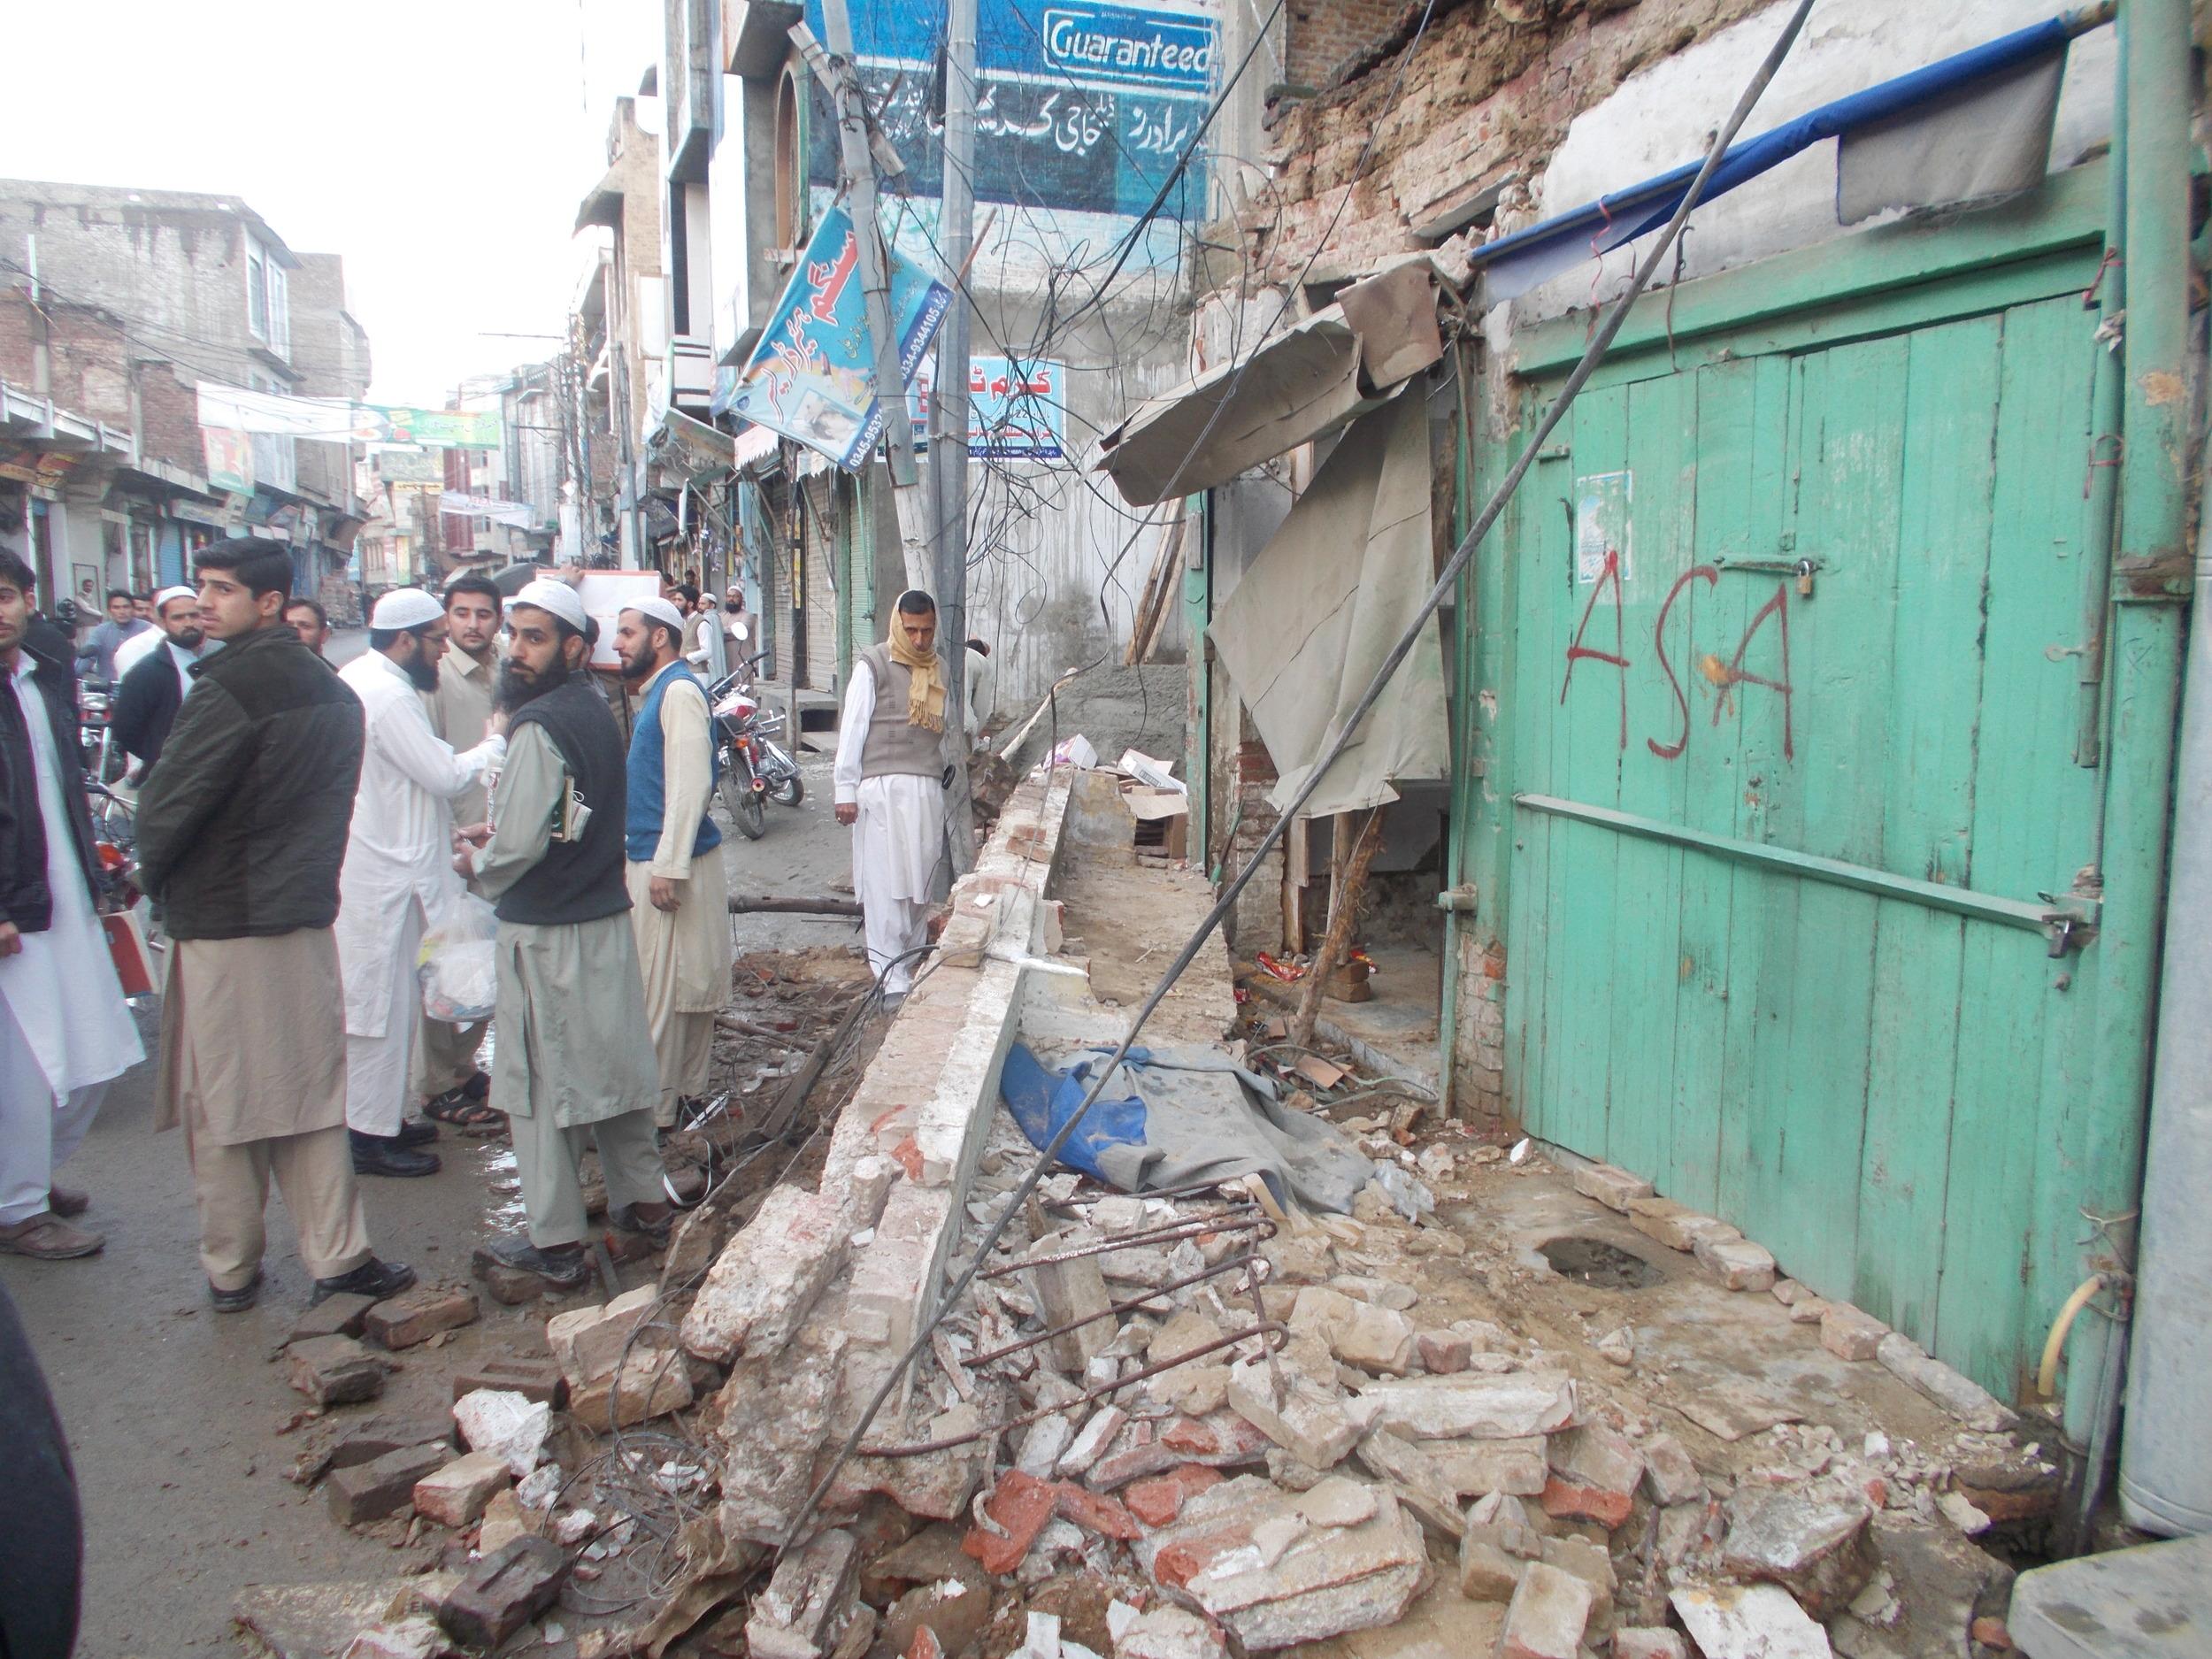 Earthquake damage in Mingora,Swat, Pakist  an (Shaukat Saleem/IRIN)